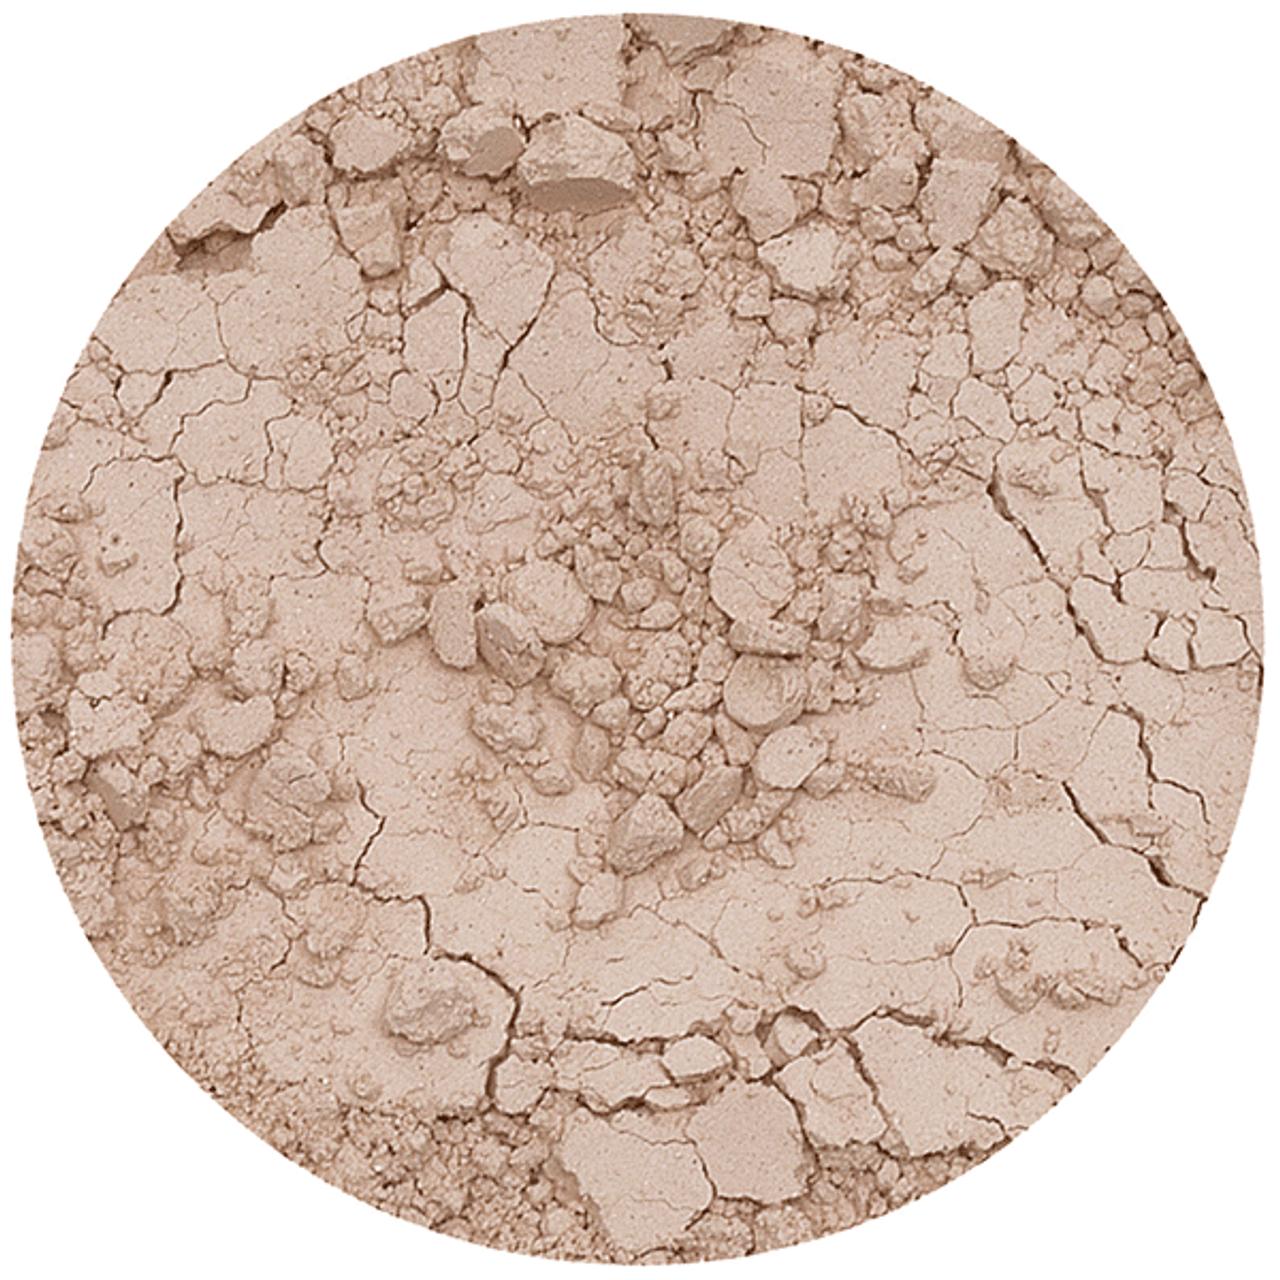 Miessence Organics Mineral Foundation Powder - Medium - beautifully organic